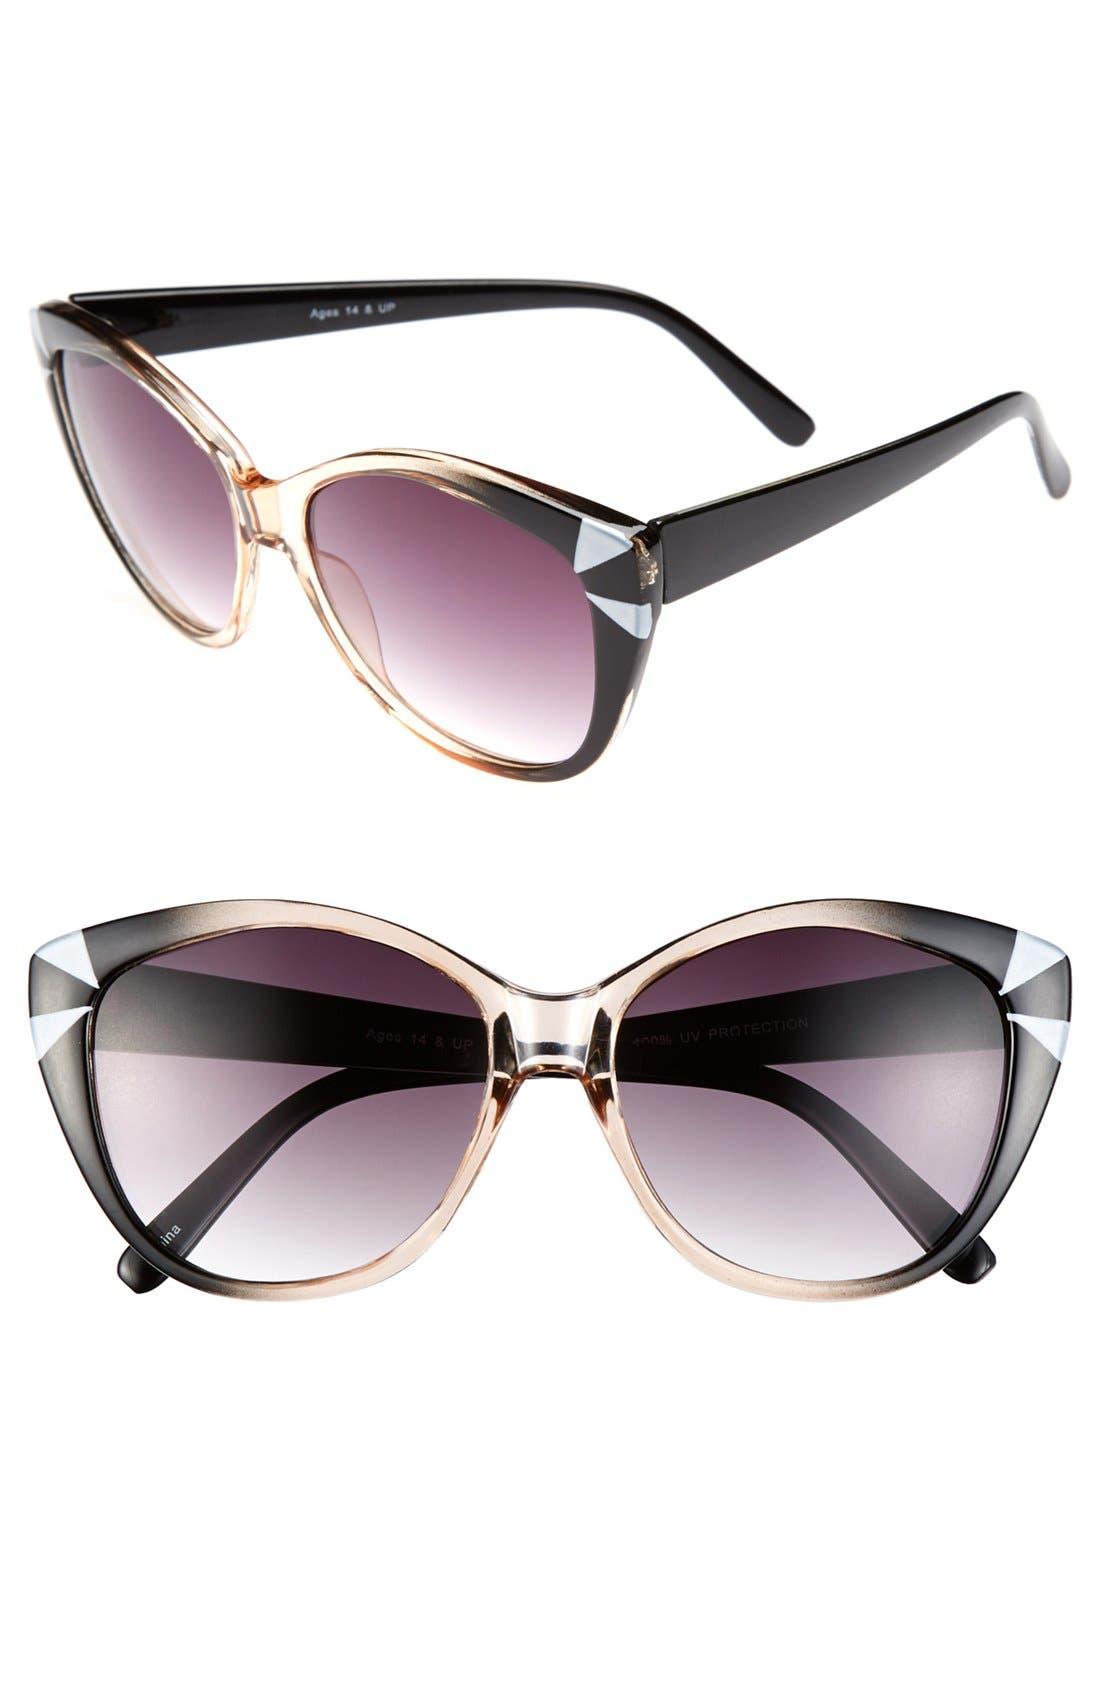 Alternate Image 1 Selected - FE NY 'Retrospective' 55mm Cat Eye Sunglasses